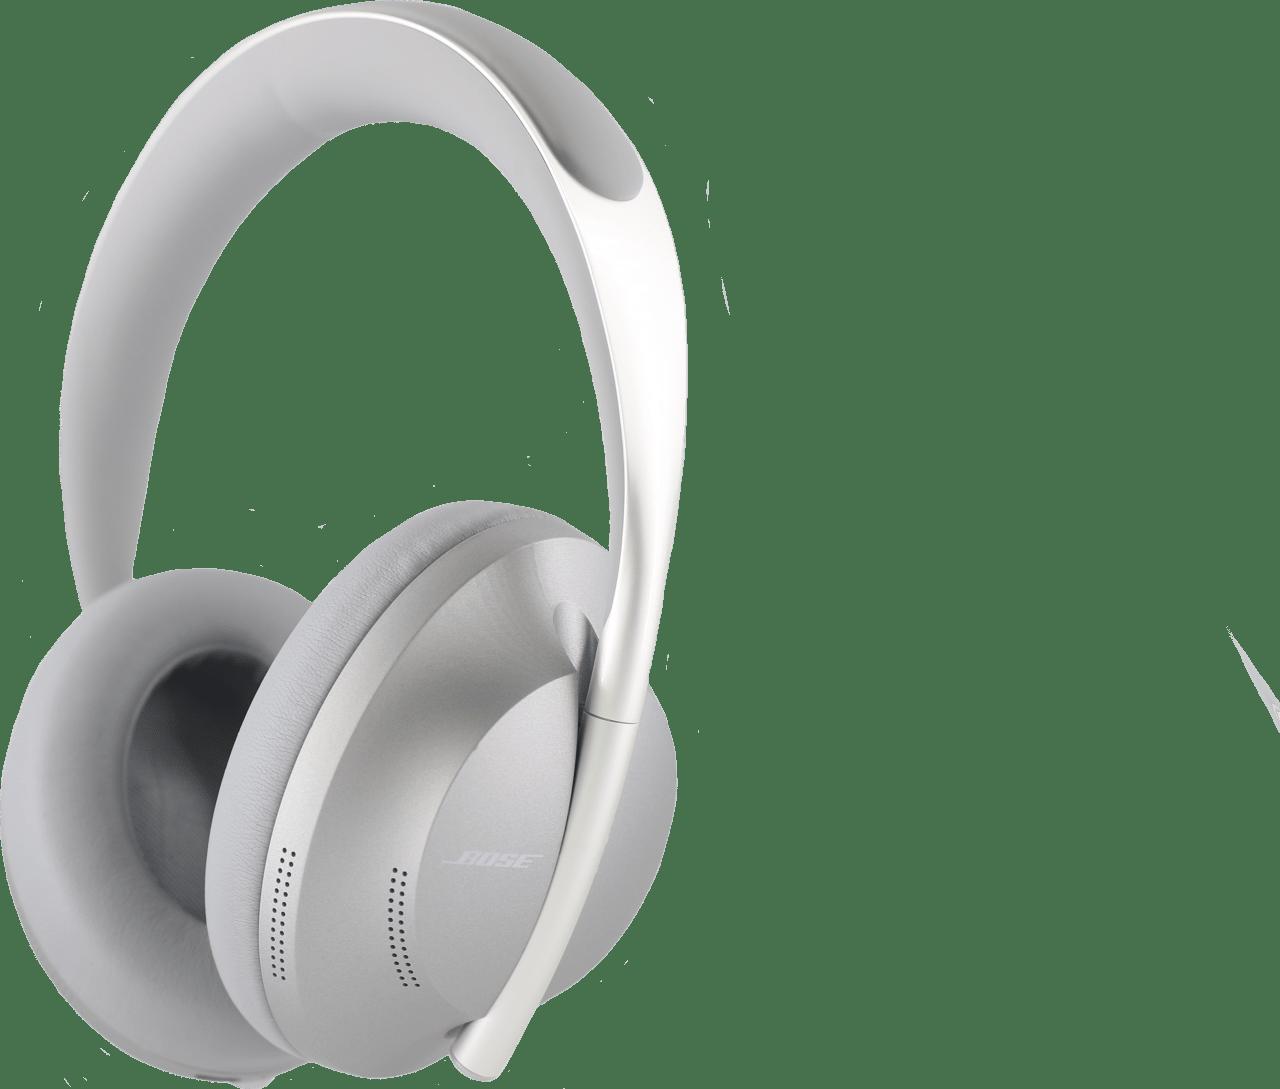 Silver Bose 700 Over-ear Bluetooth Headphones.1